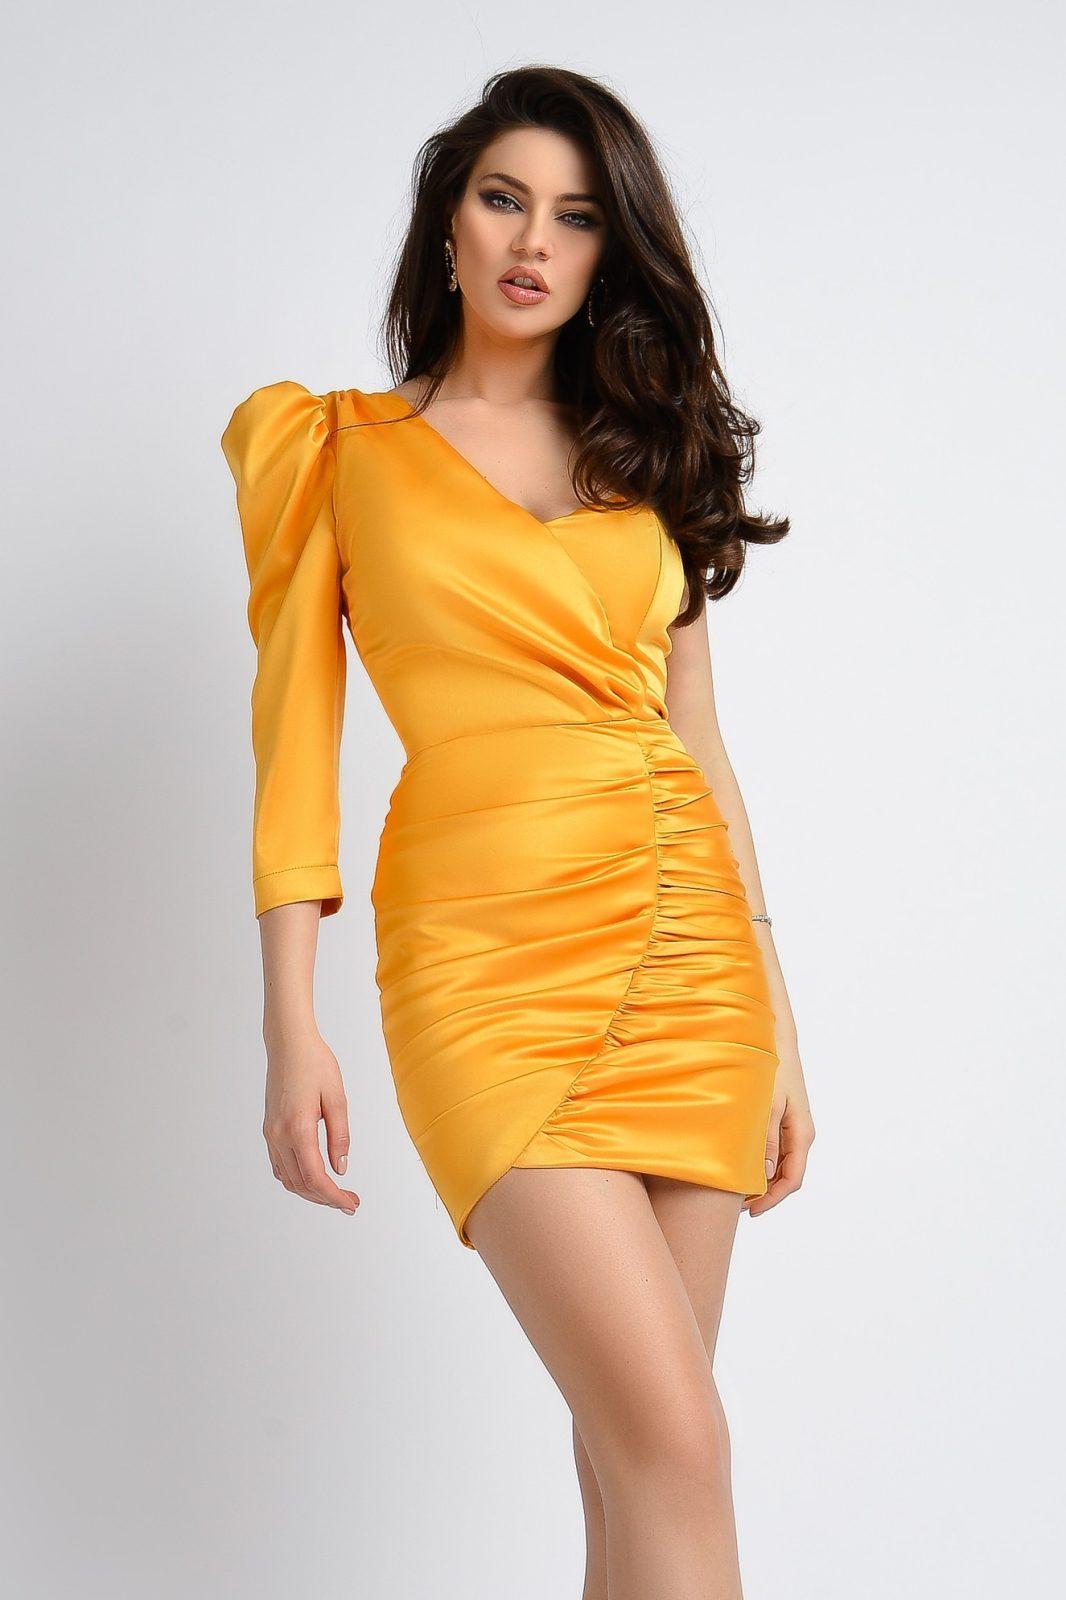 Rochie De Seara Scurta Din Tafta Galbena Rn2339 Smart Shopping Online